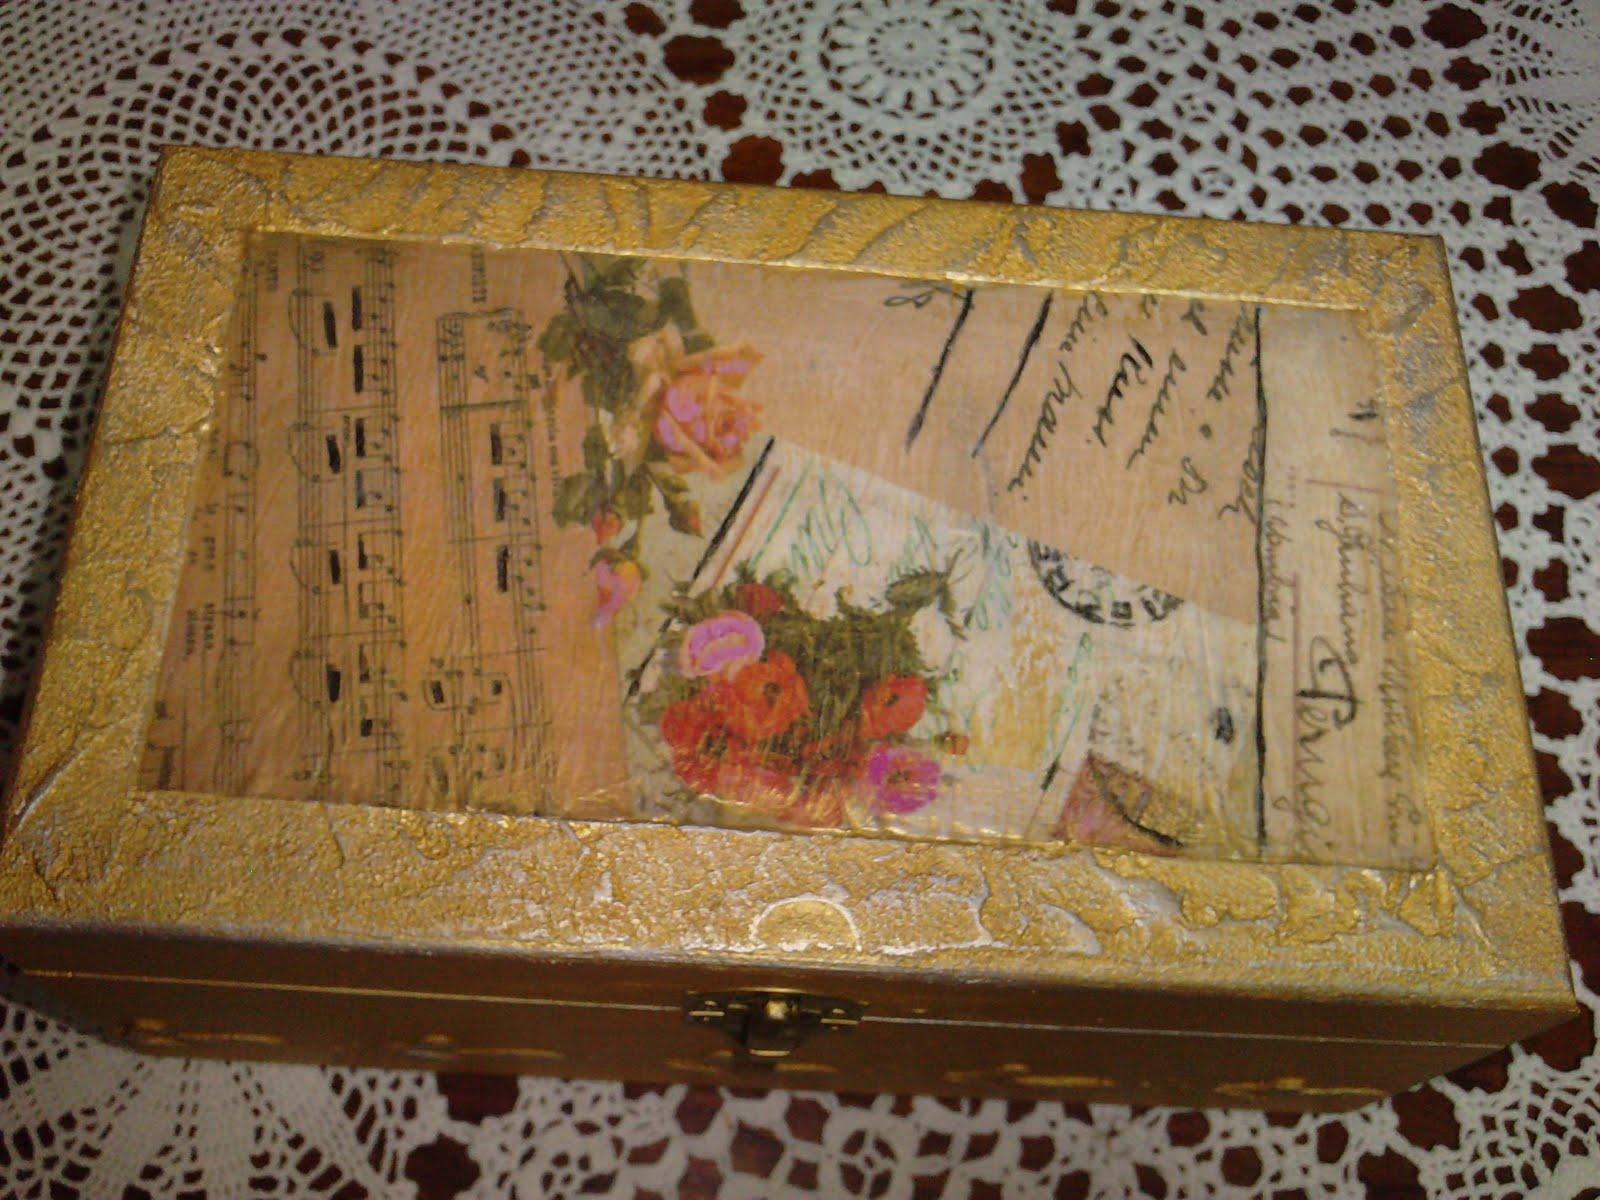 Artesania mydina cajas de madera decoradas en diferentes - Cosas de madera para decorar ...